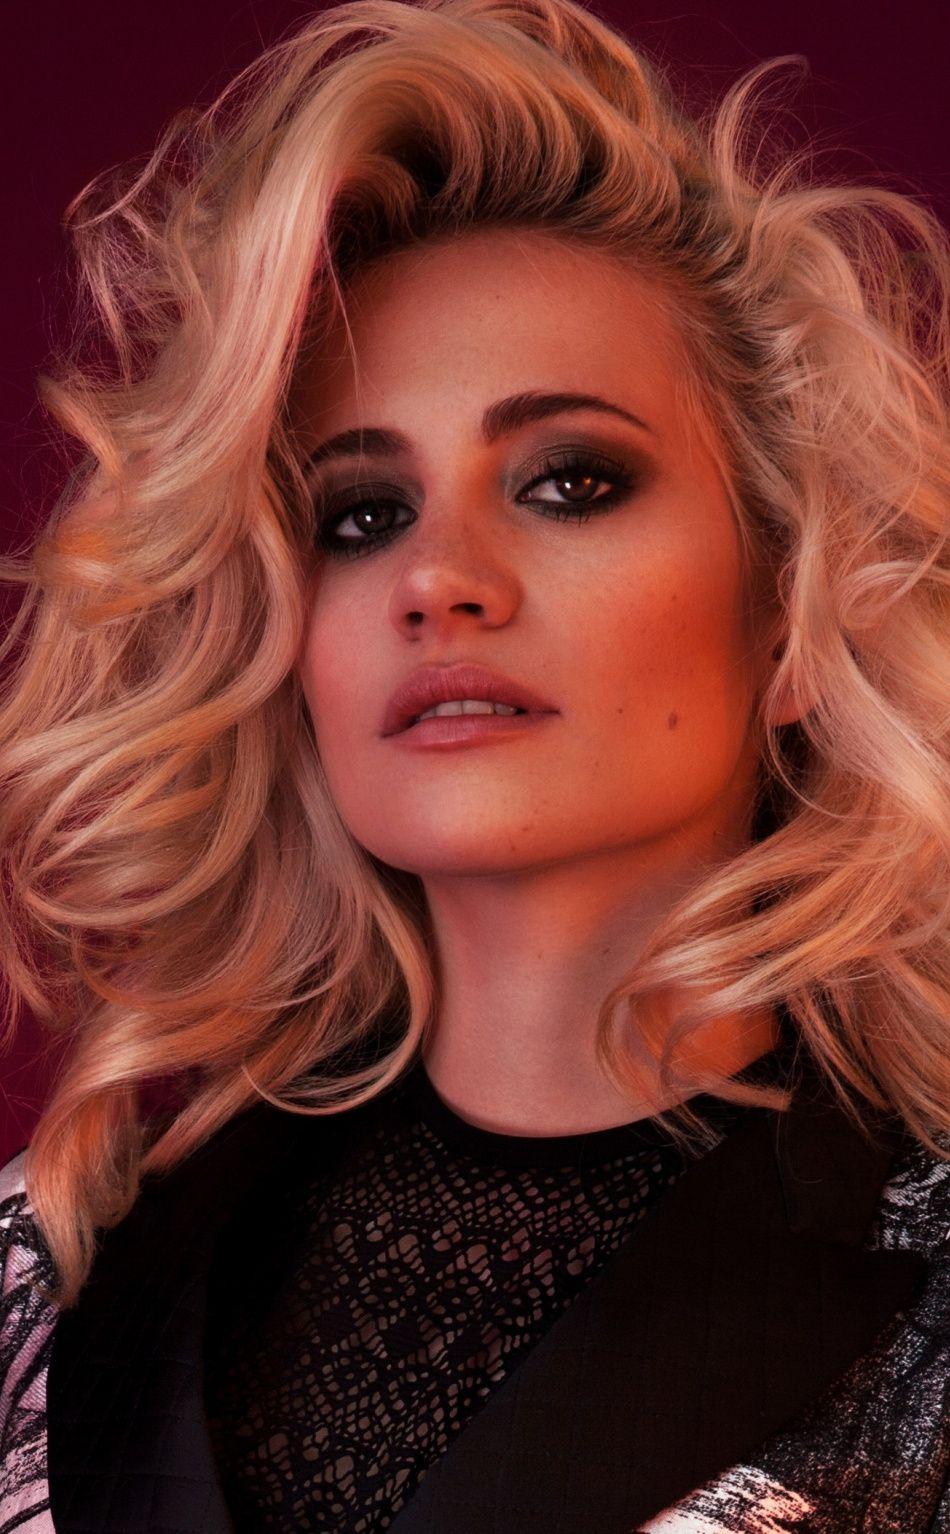 Pixie Lott Blonde Celebrity Beautiful 950x1534 Wallpaper Celebrity Wallpapers Beautiful Makeup Pixie